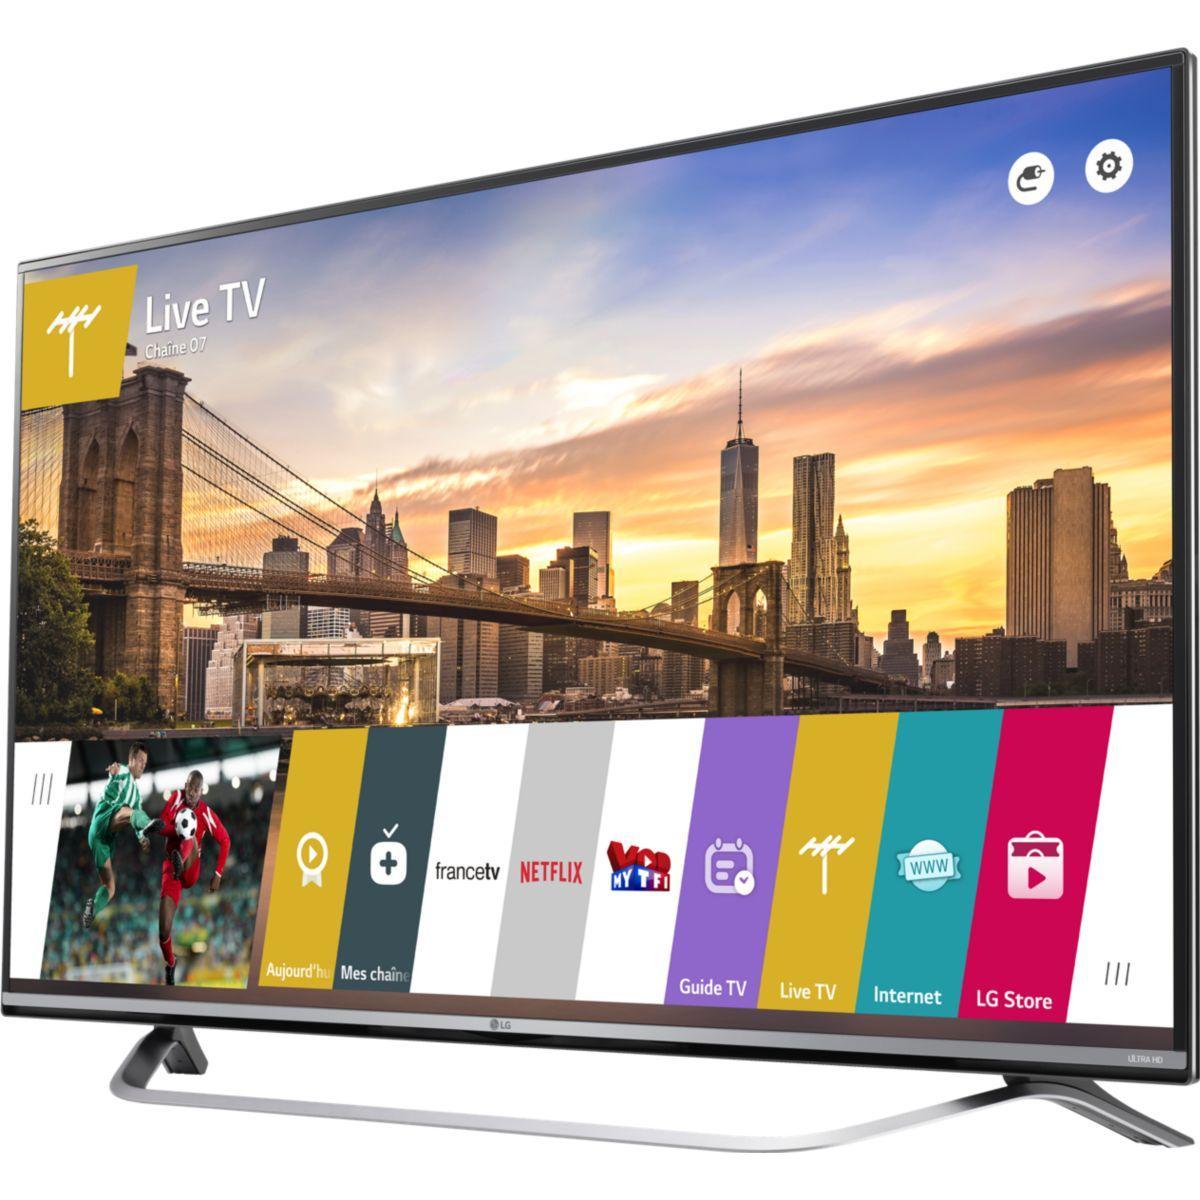 TV LG 55UF778V 4K 900Hz UCI SMART TV